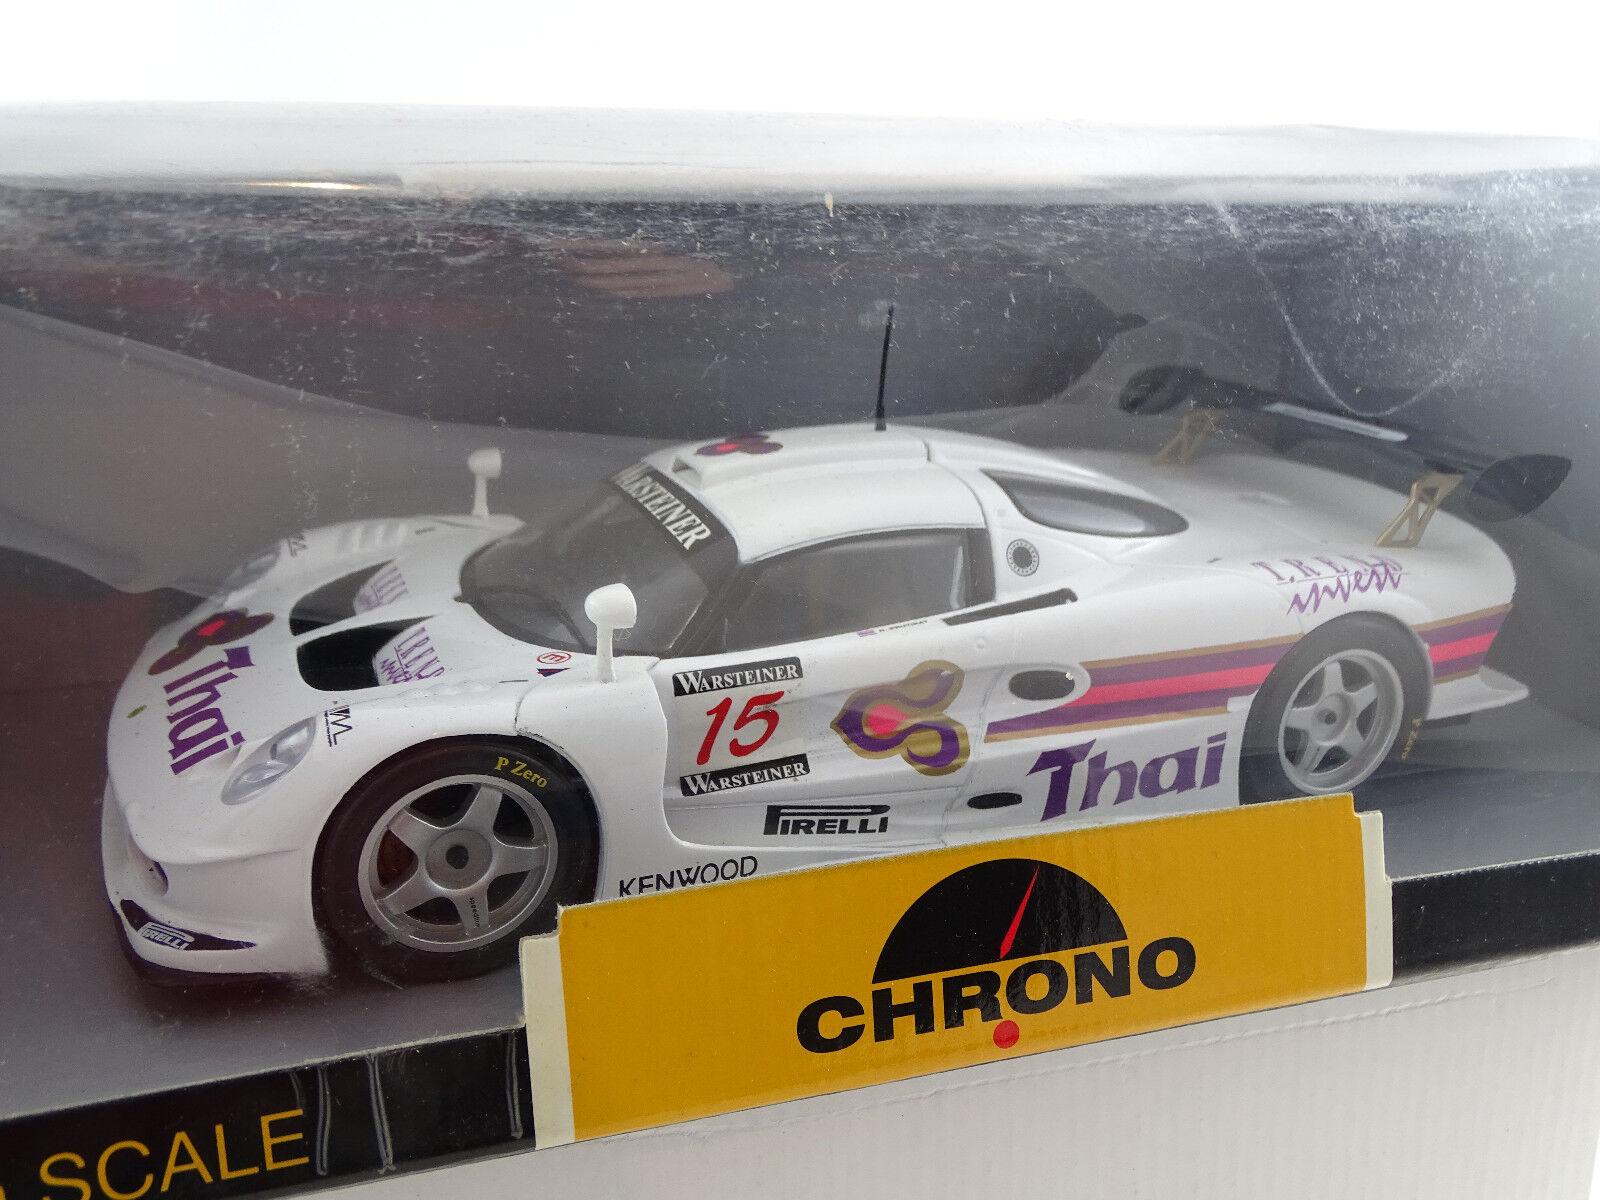 1 18 Chrono  h1072 LOTUS elise gt1 Thai R. Prutirat 1997  15 Limited RAR